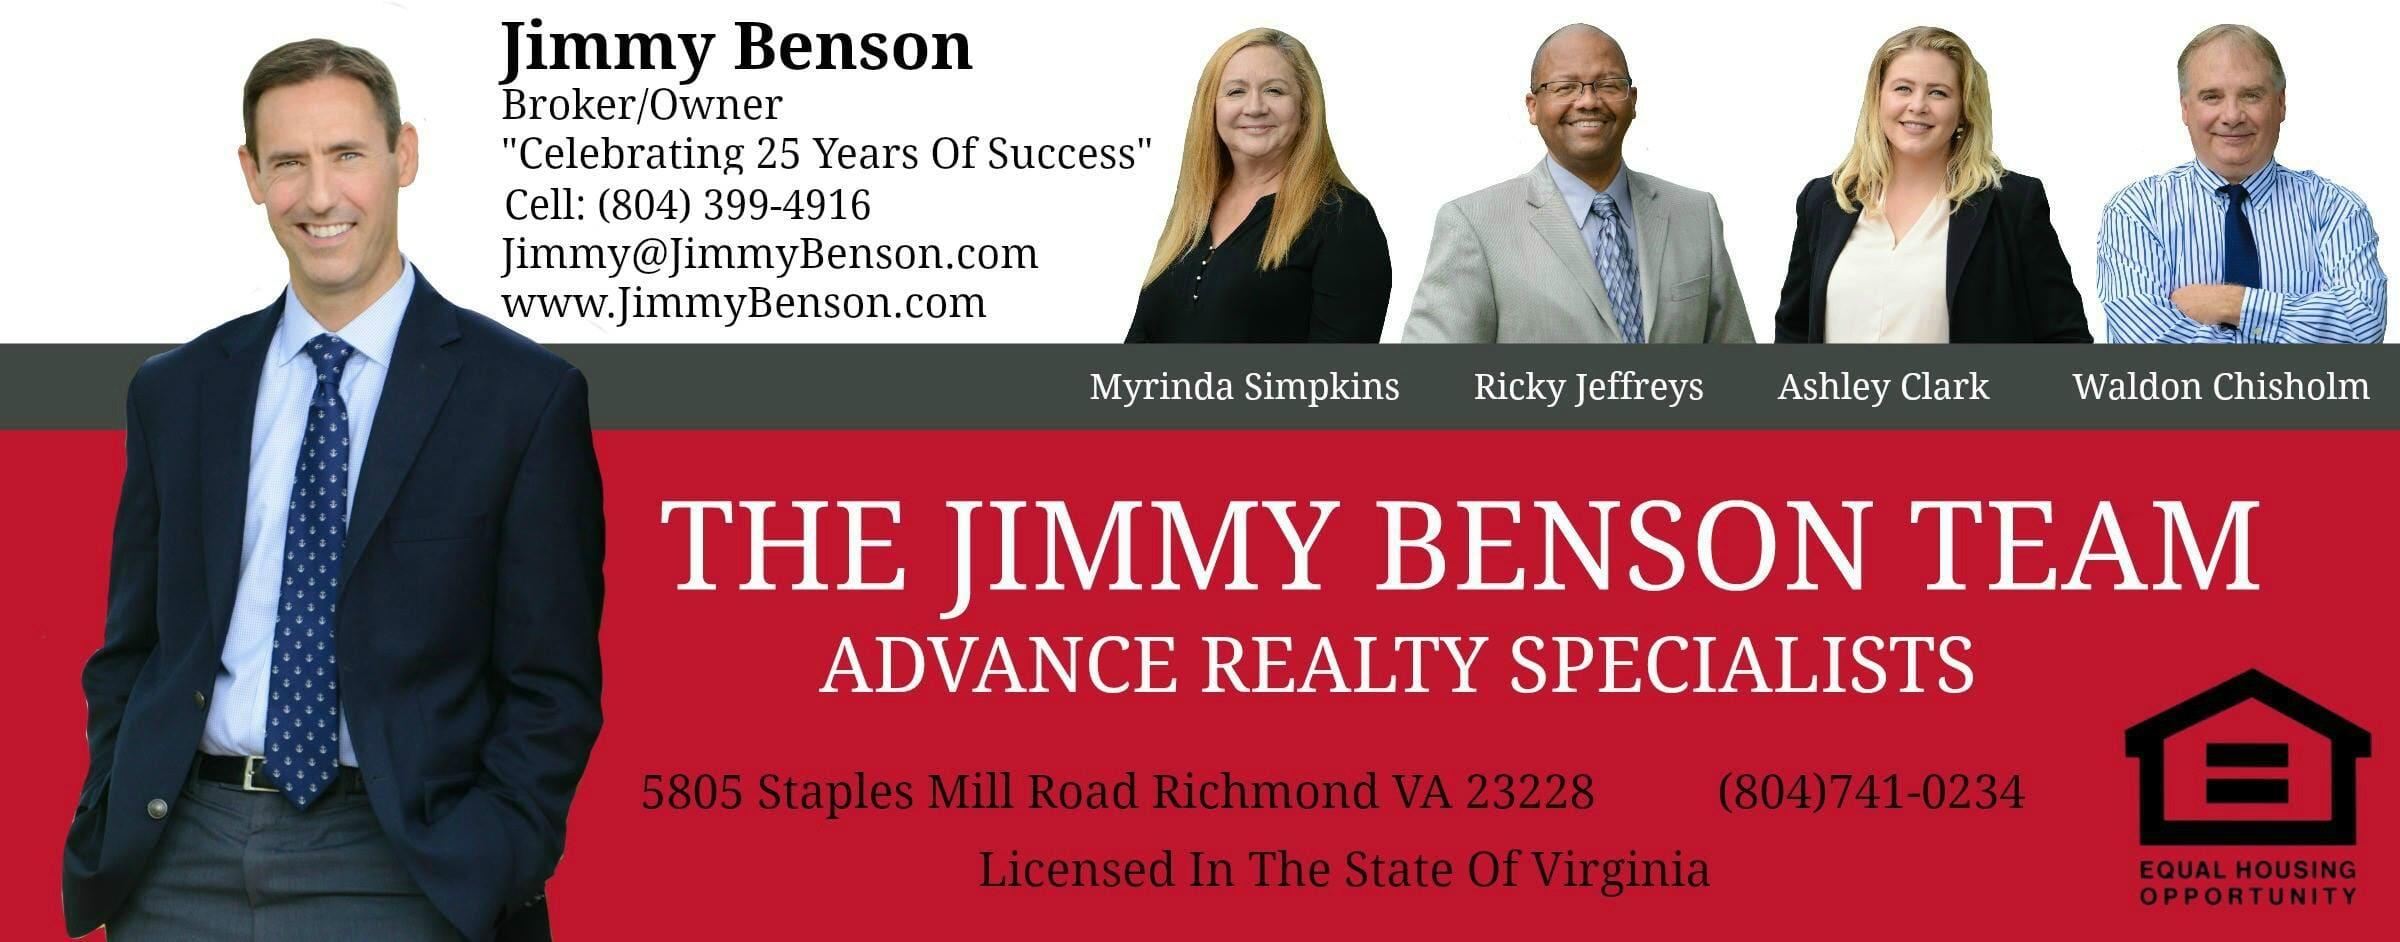 Jimmy Benson image 5